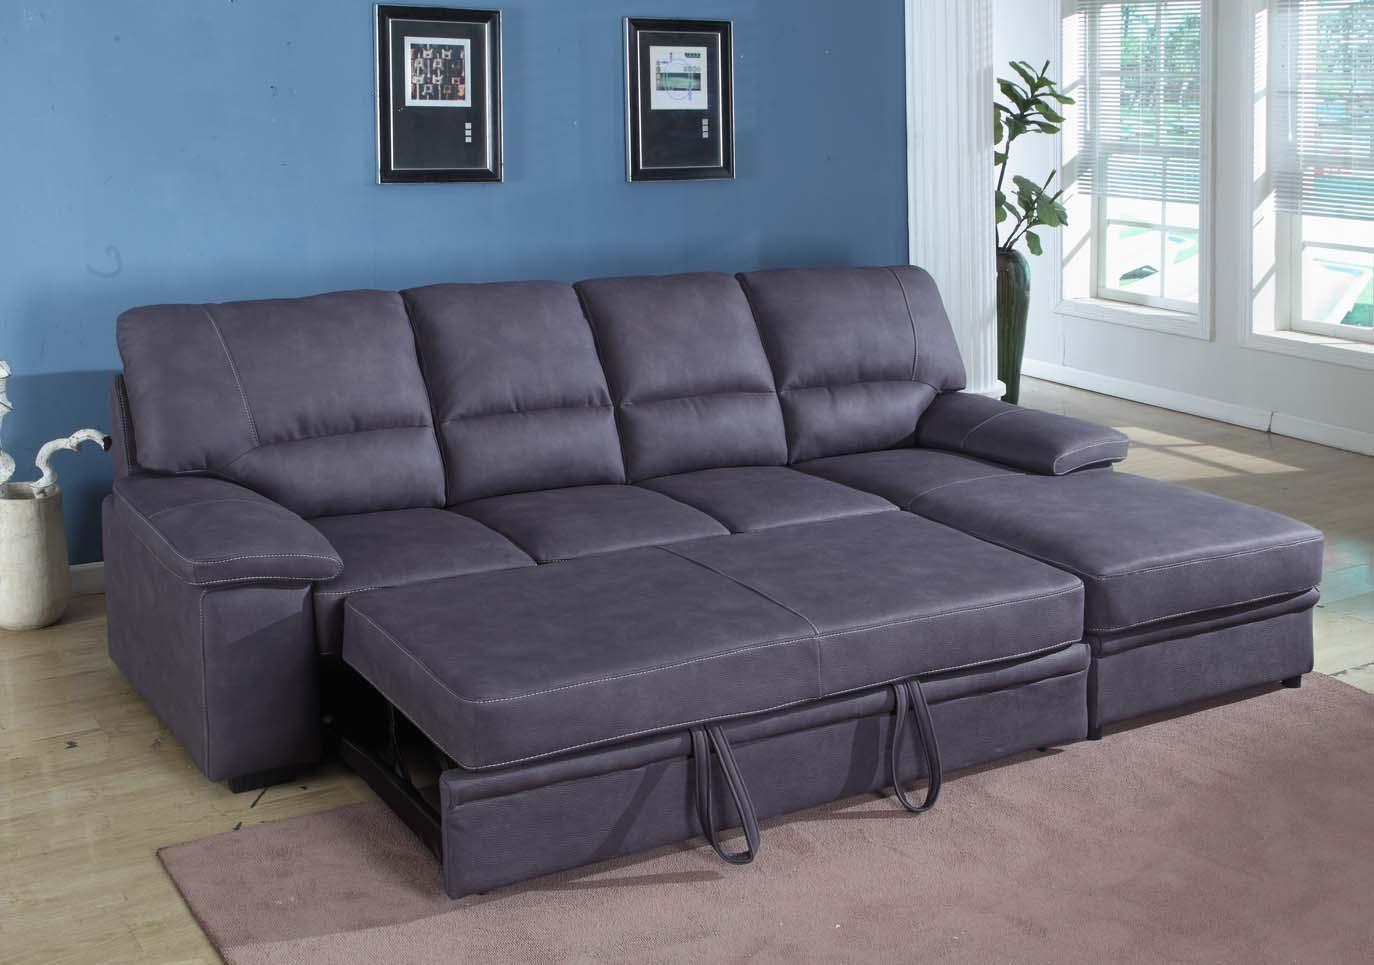 Furniture : Rustic Overstock Sleeper Sofa 2017 Furnitures Within Austin Sleeper Sofas (Image 4 of 20)